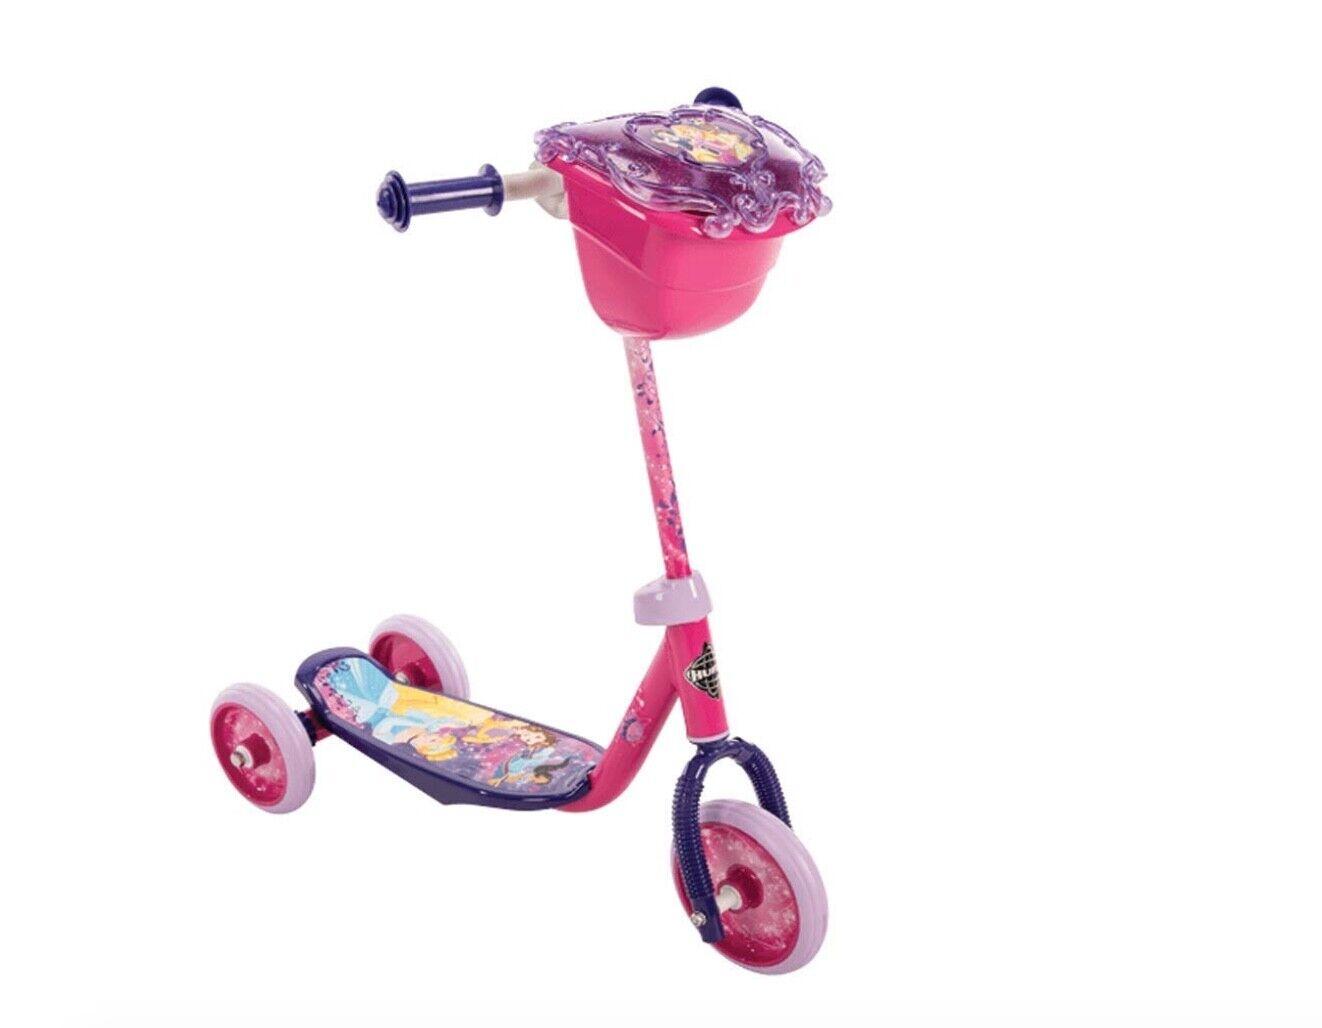 Huffy Disney Princess Girls Kids Toddler 3 Wheel Scooter With Basket For Sale Online Ebay